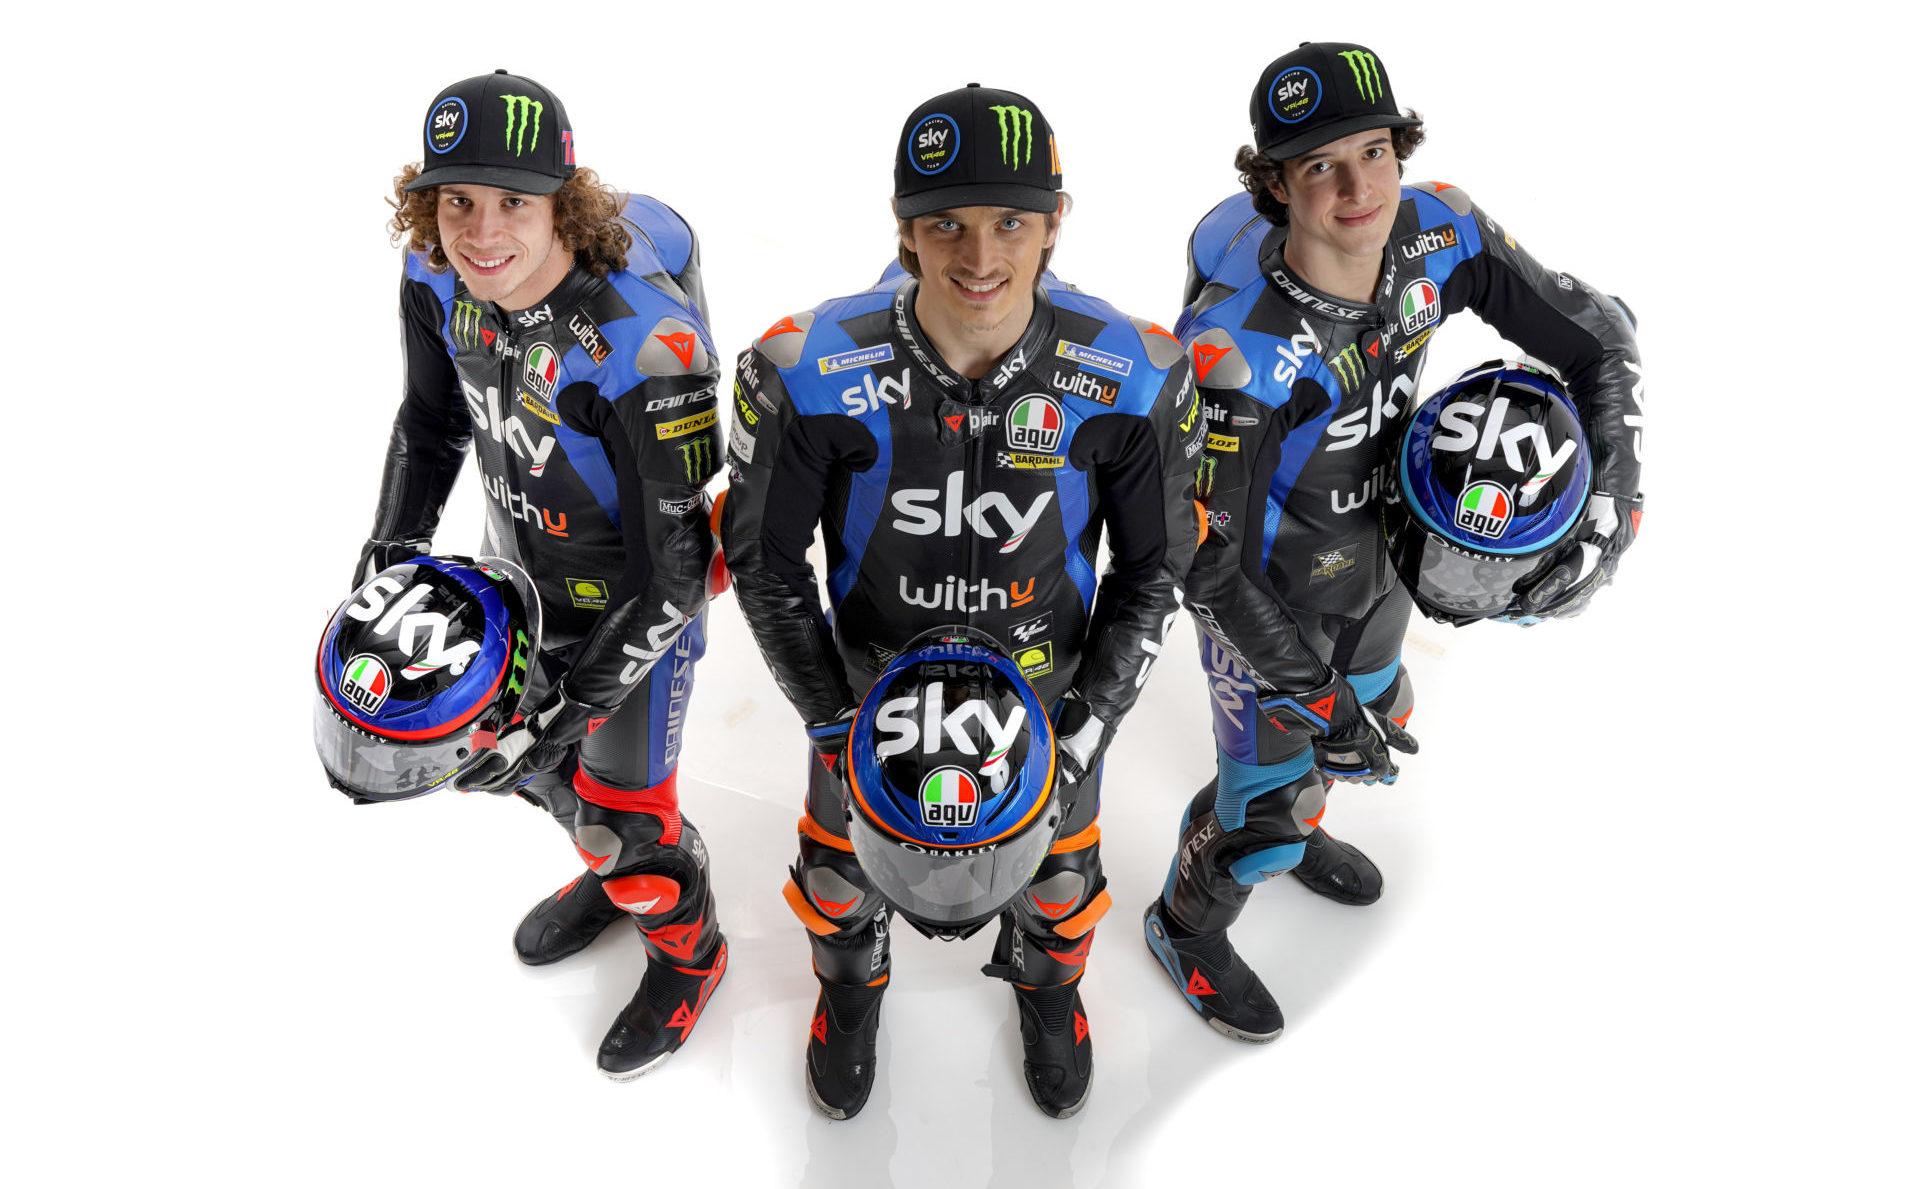 Sky Racing Team VR46 riders Marco Bezzecchi (left), Luca Marini (center), and Celestino Vietti Ramus (right). Photo courtesy Sky Racing Team VR46.